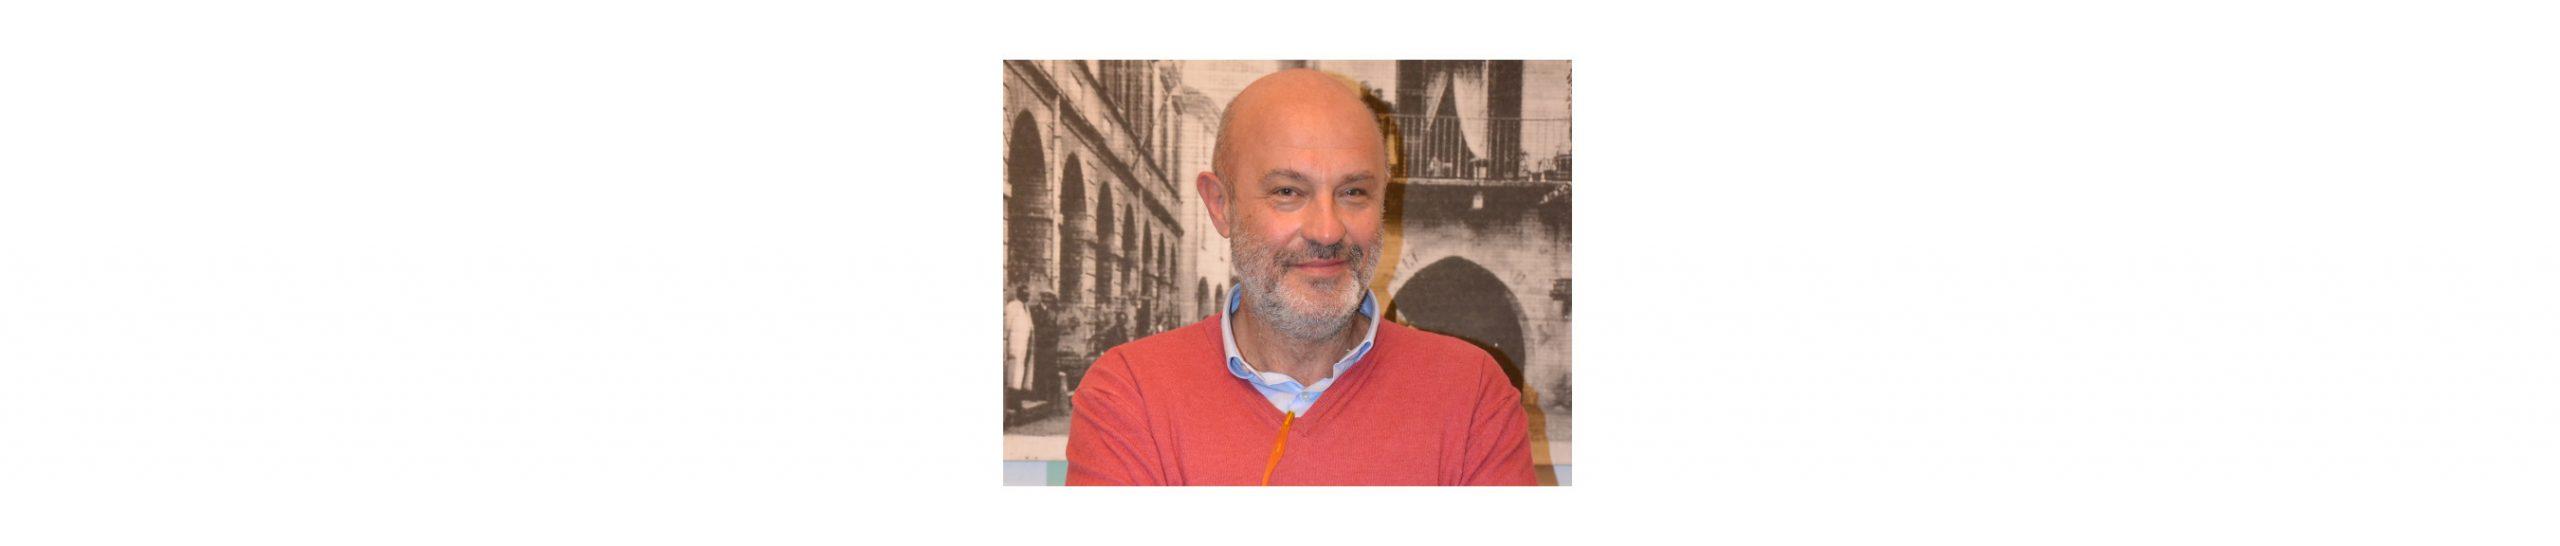 "Conosciamo la giunta regionale: Riccardo Milan. ""Dal Lago d'Orta, al Piemonte Tutto""."